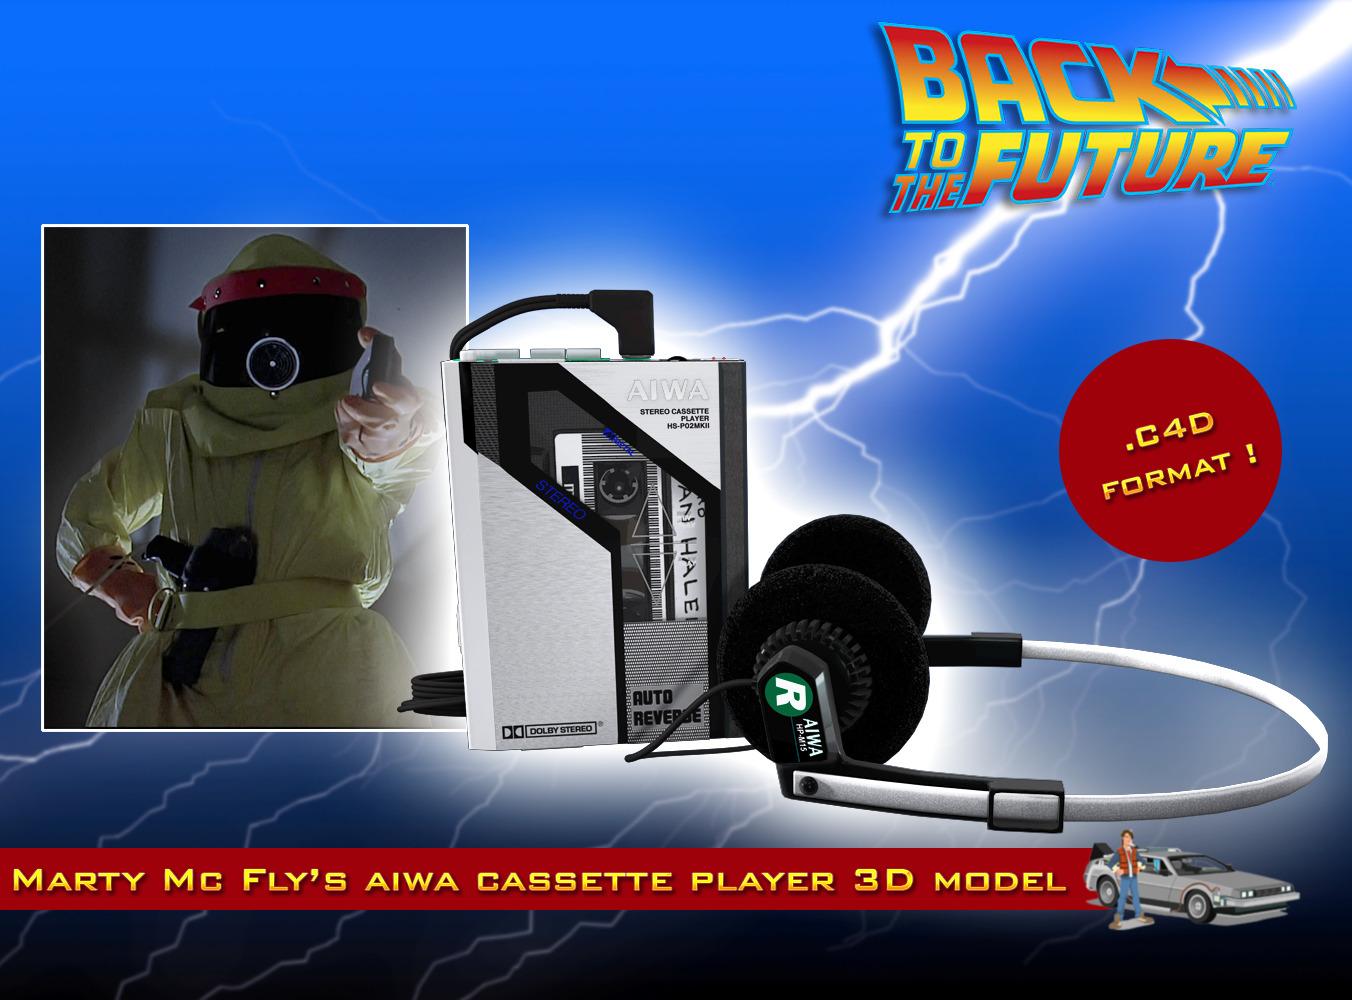 Bttf Aiwa Walkman By Marcel Studios 3docean